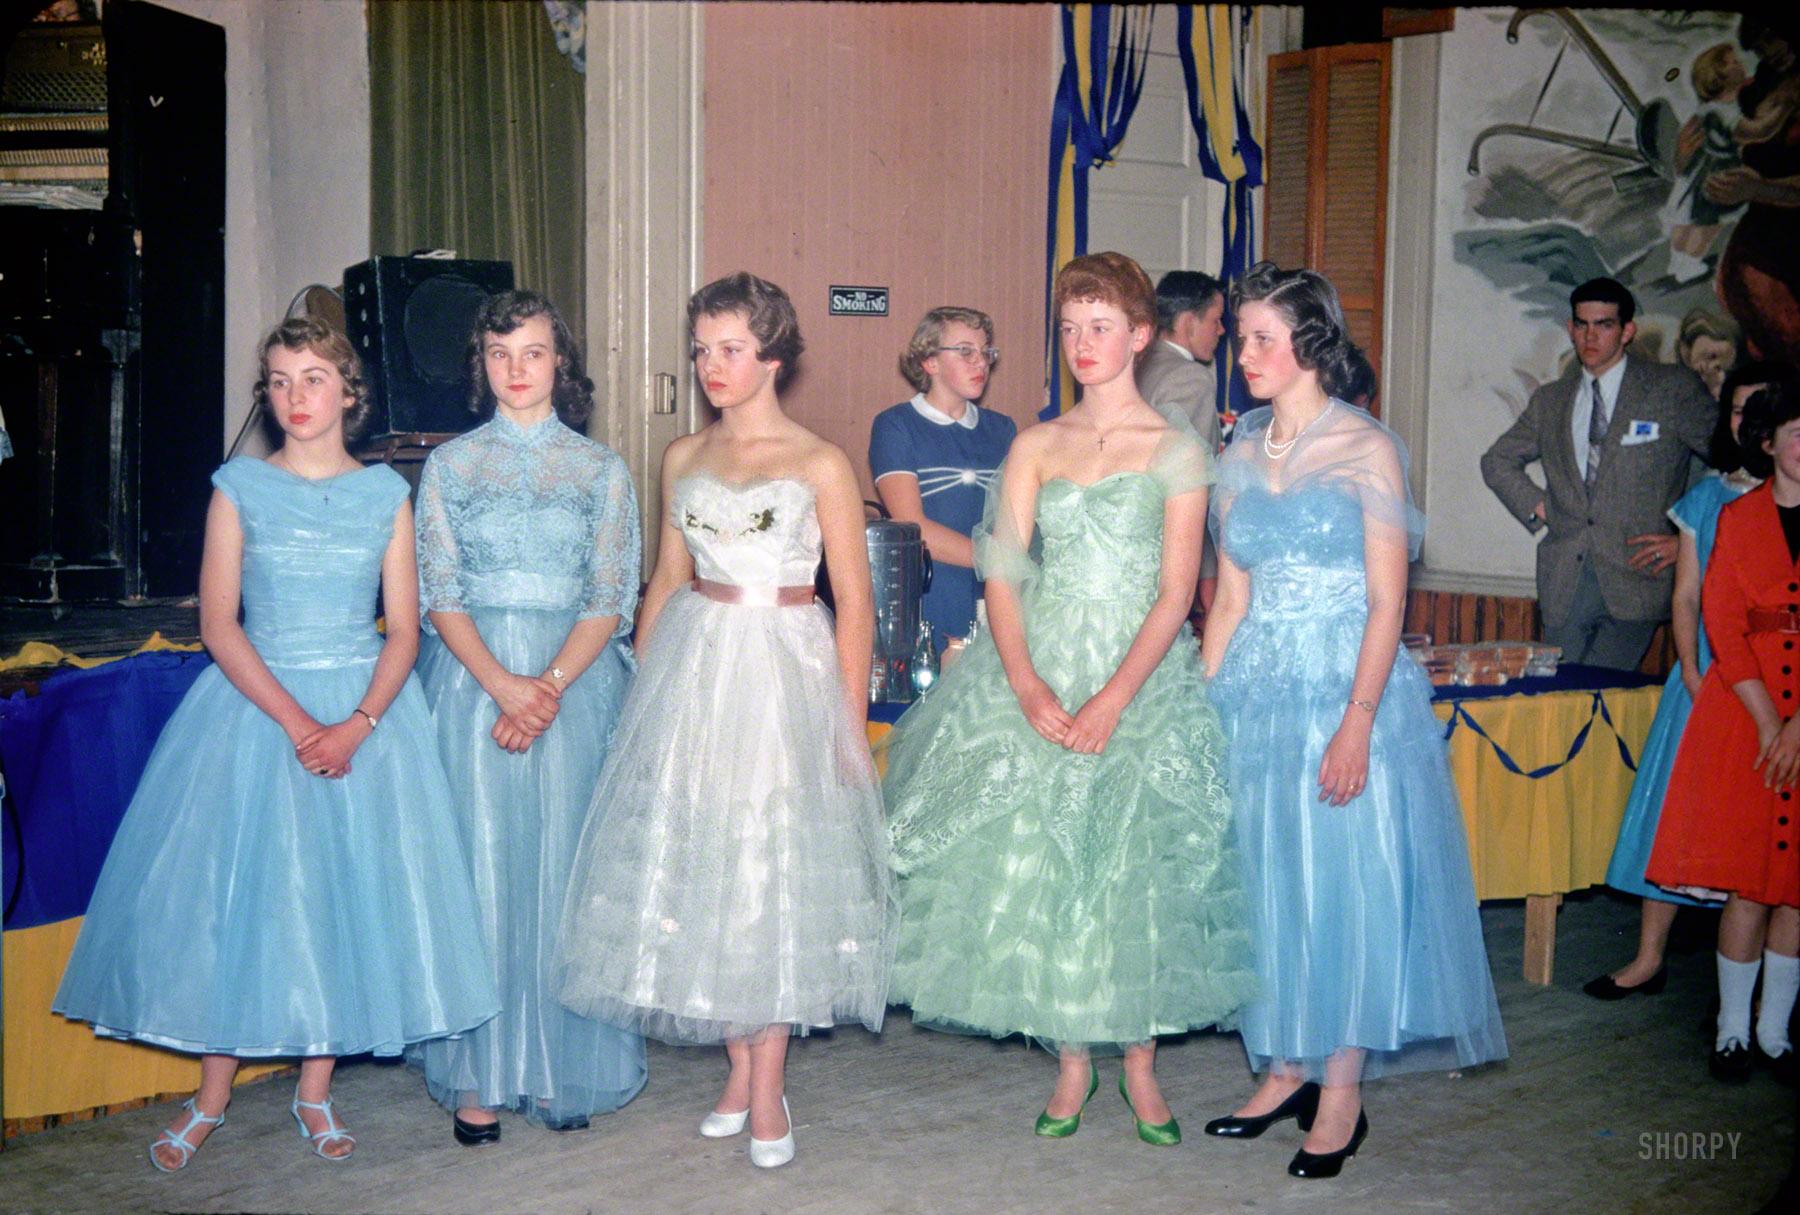 Boys Wearing Prom Dresses